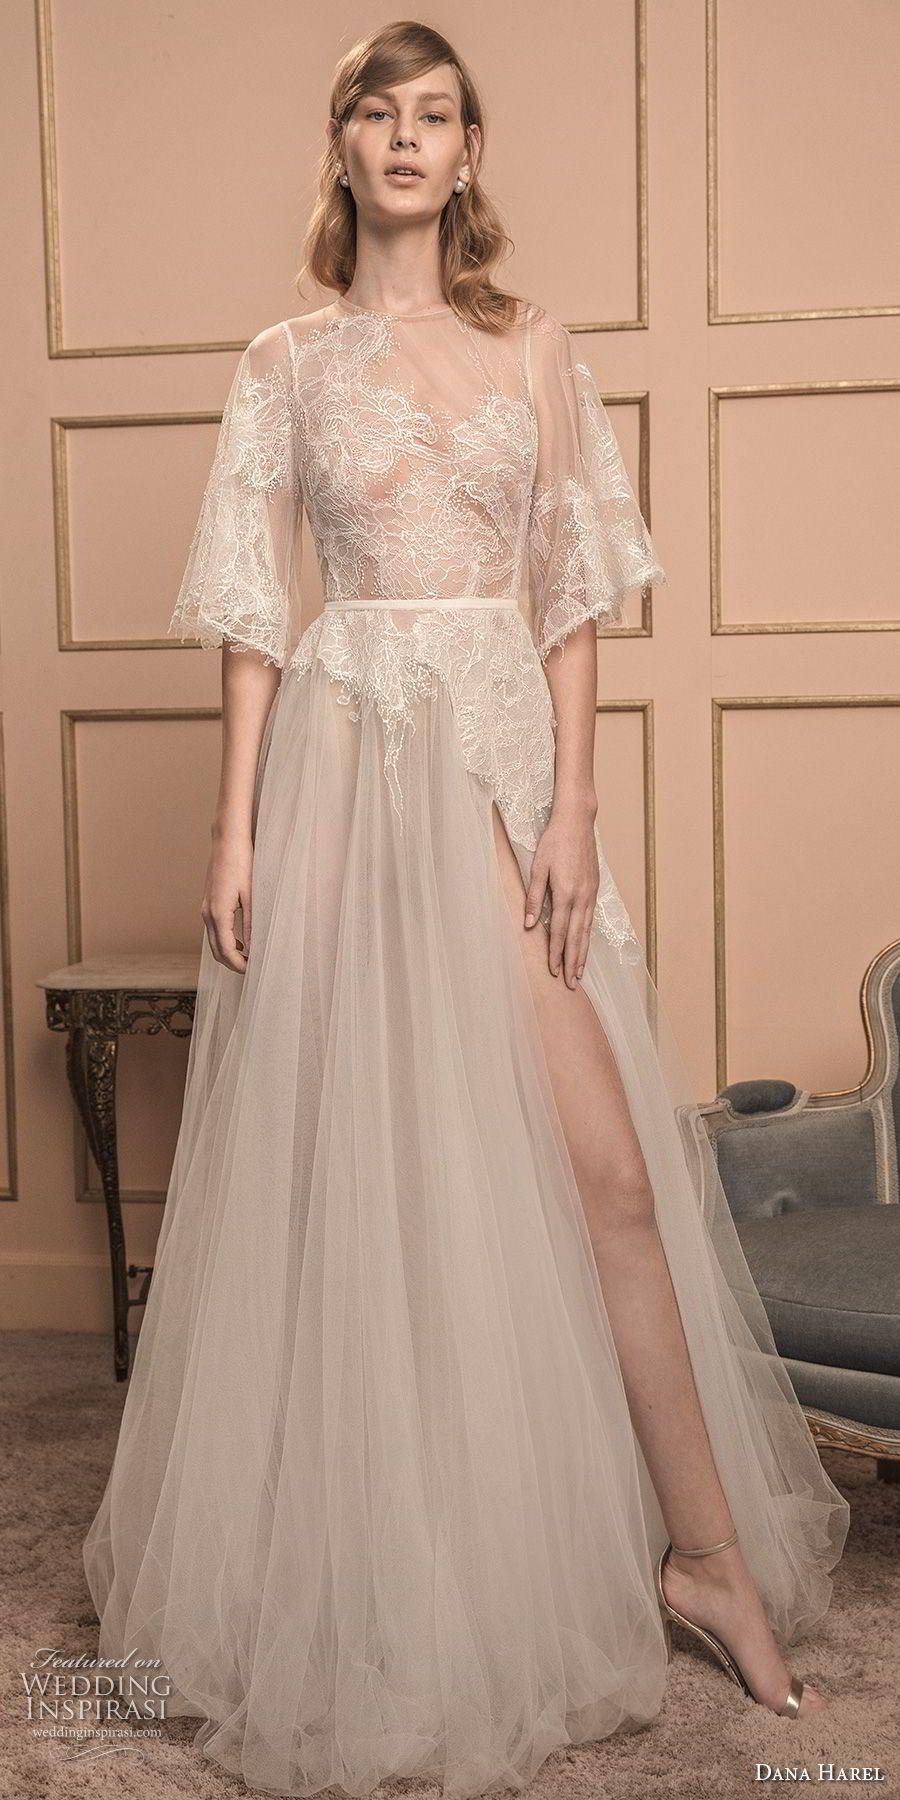 Dana harel wedding dresses u spotlight on this new bridal